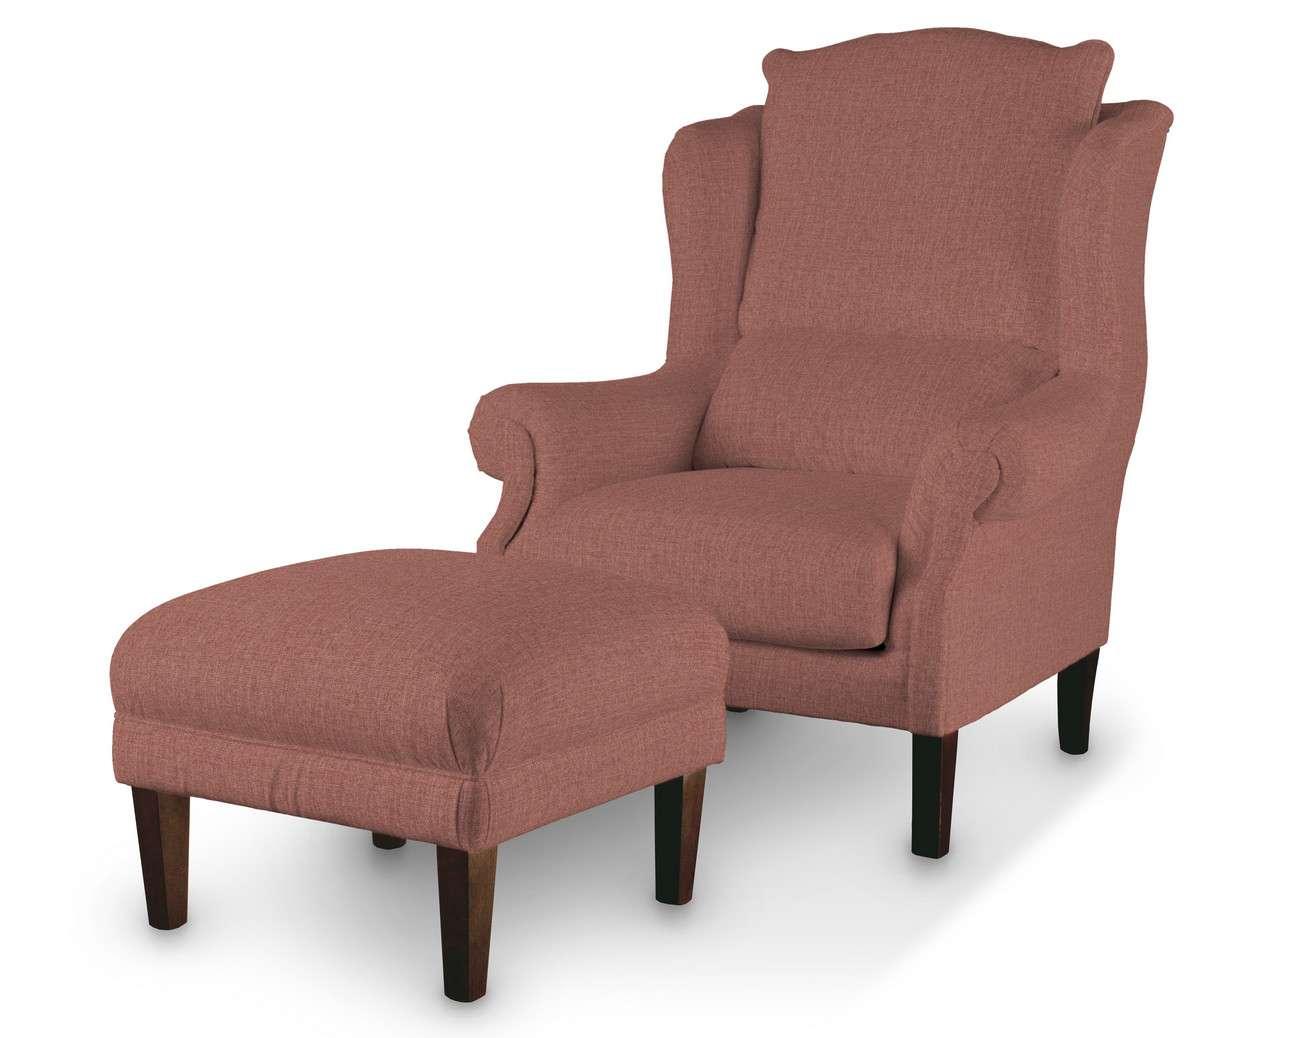 Podnóżek do fotela w kolekcji City, tkanina: 704-84